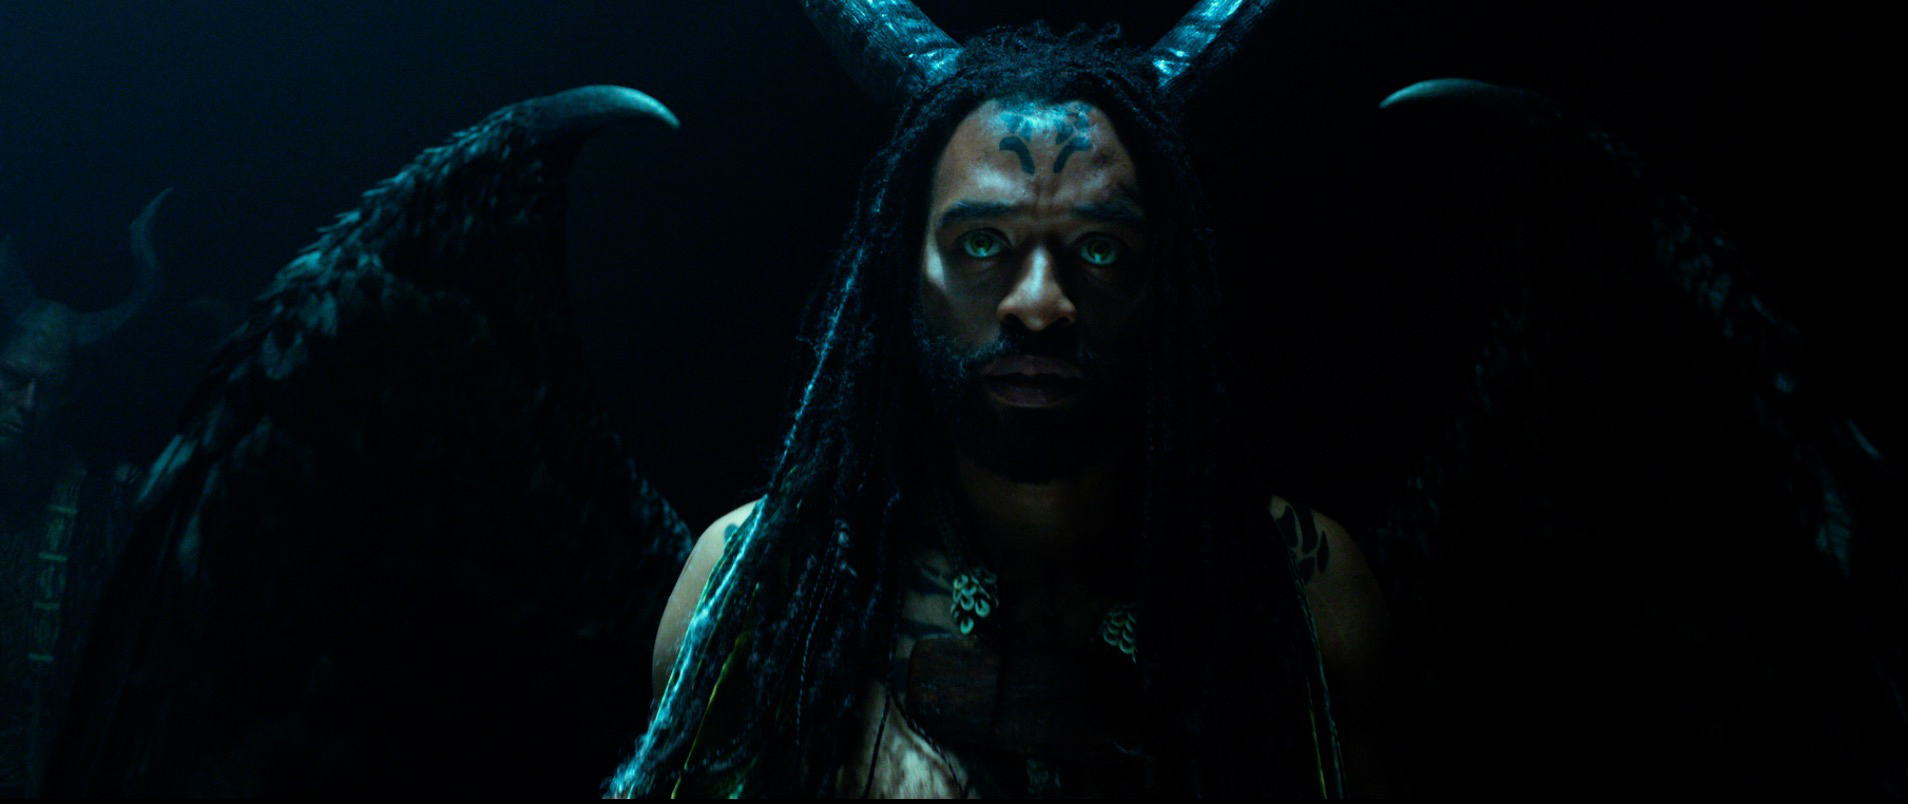 Maleficent, Maleficent Mistress of Evil, Sleeping Beauty, Disney films,